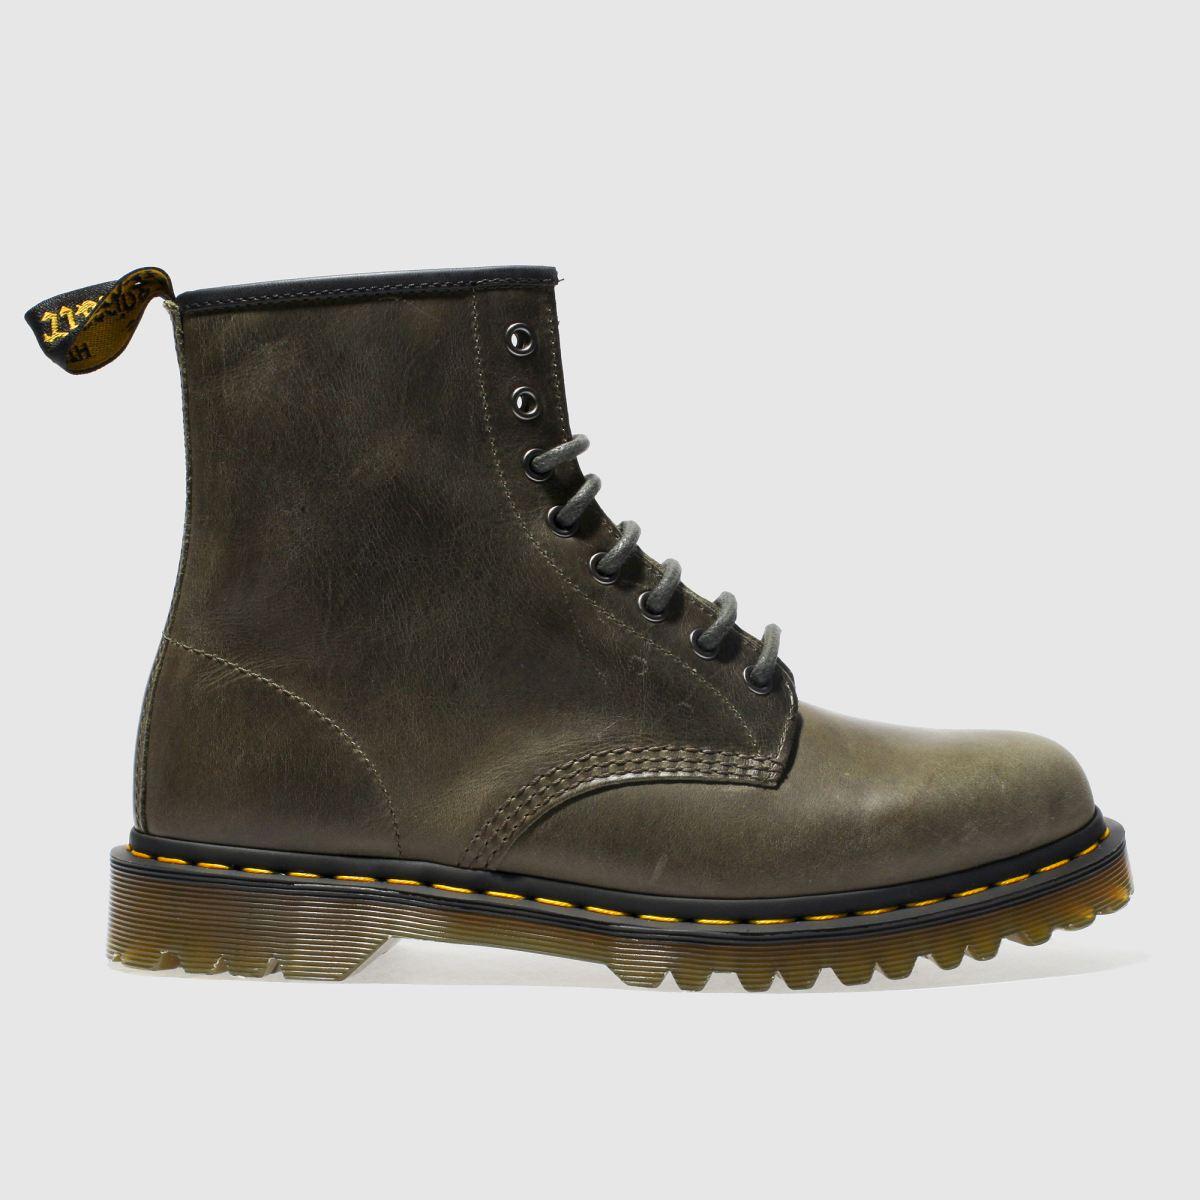 Dr Martens Khaki 1460 8-eye Boots